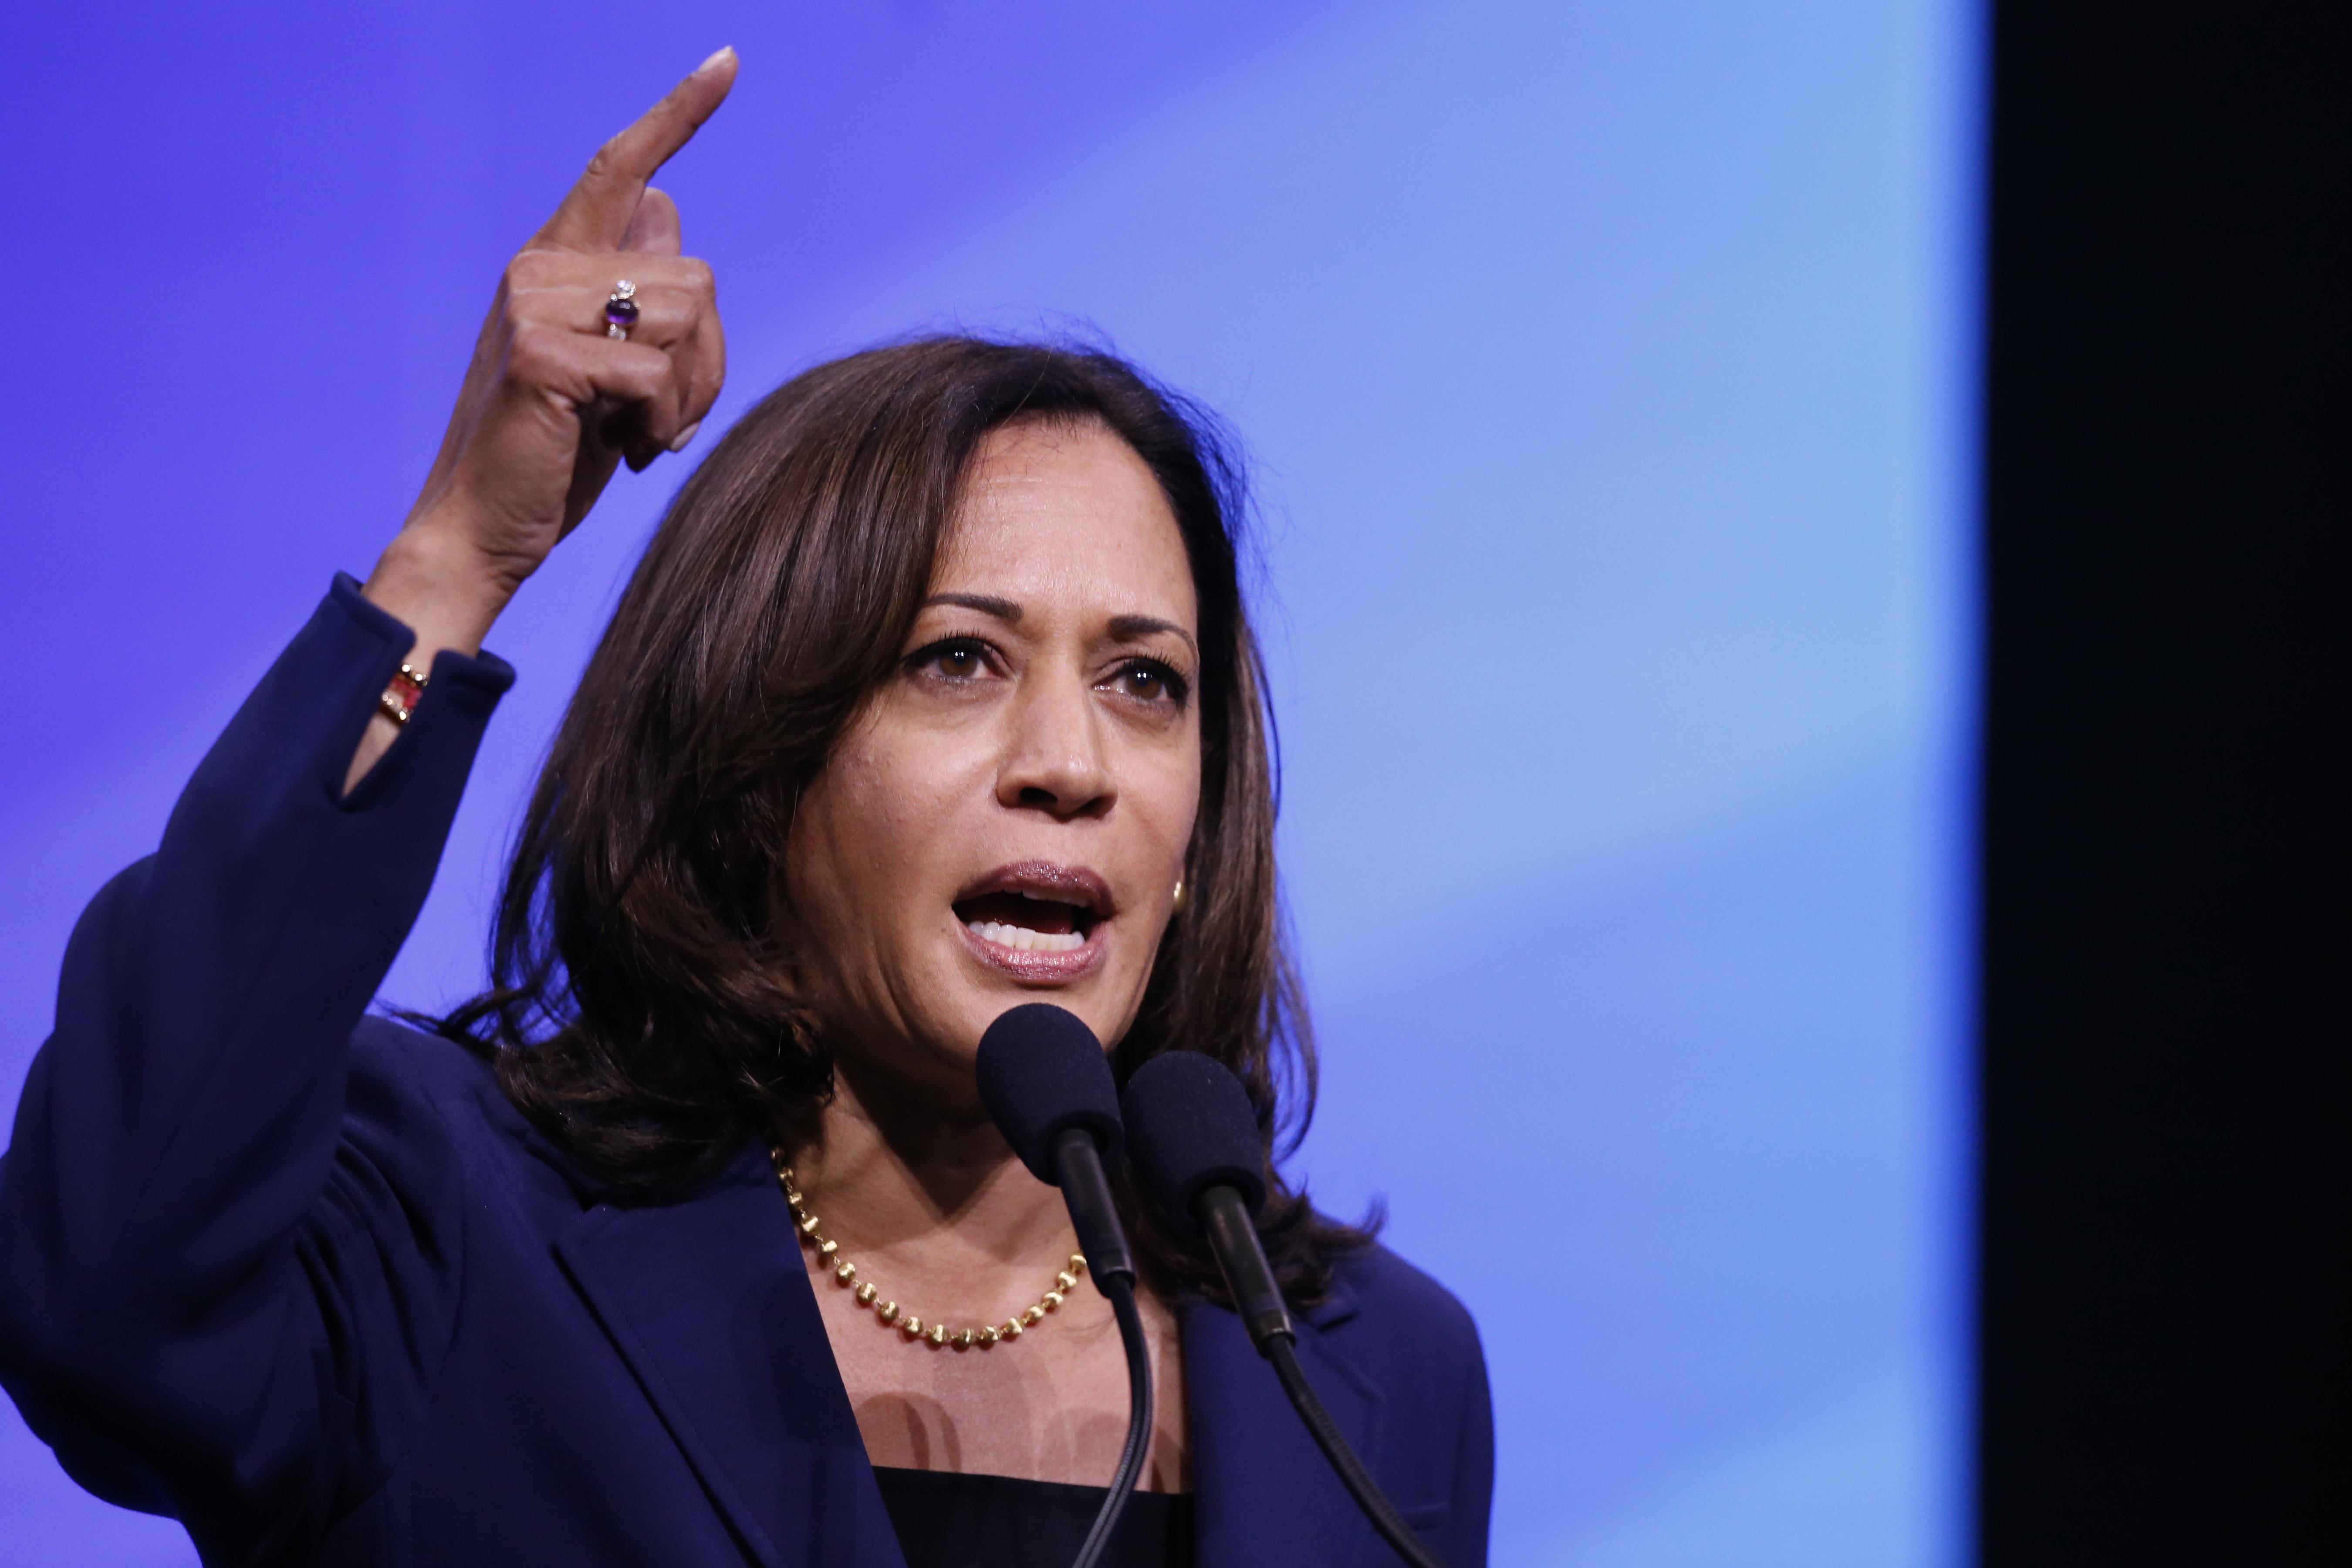 Kamala Harris unveils plan to overhaul criminal justice system